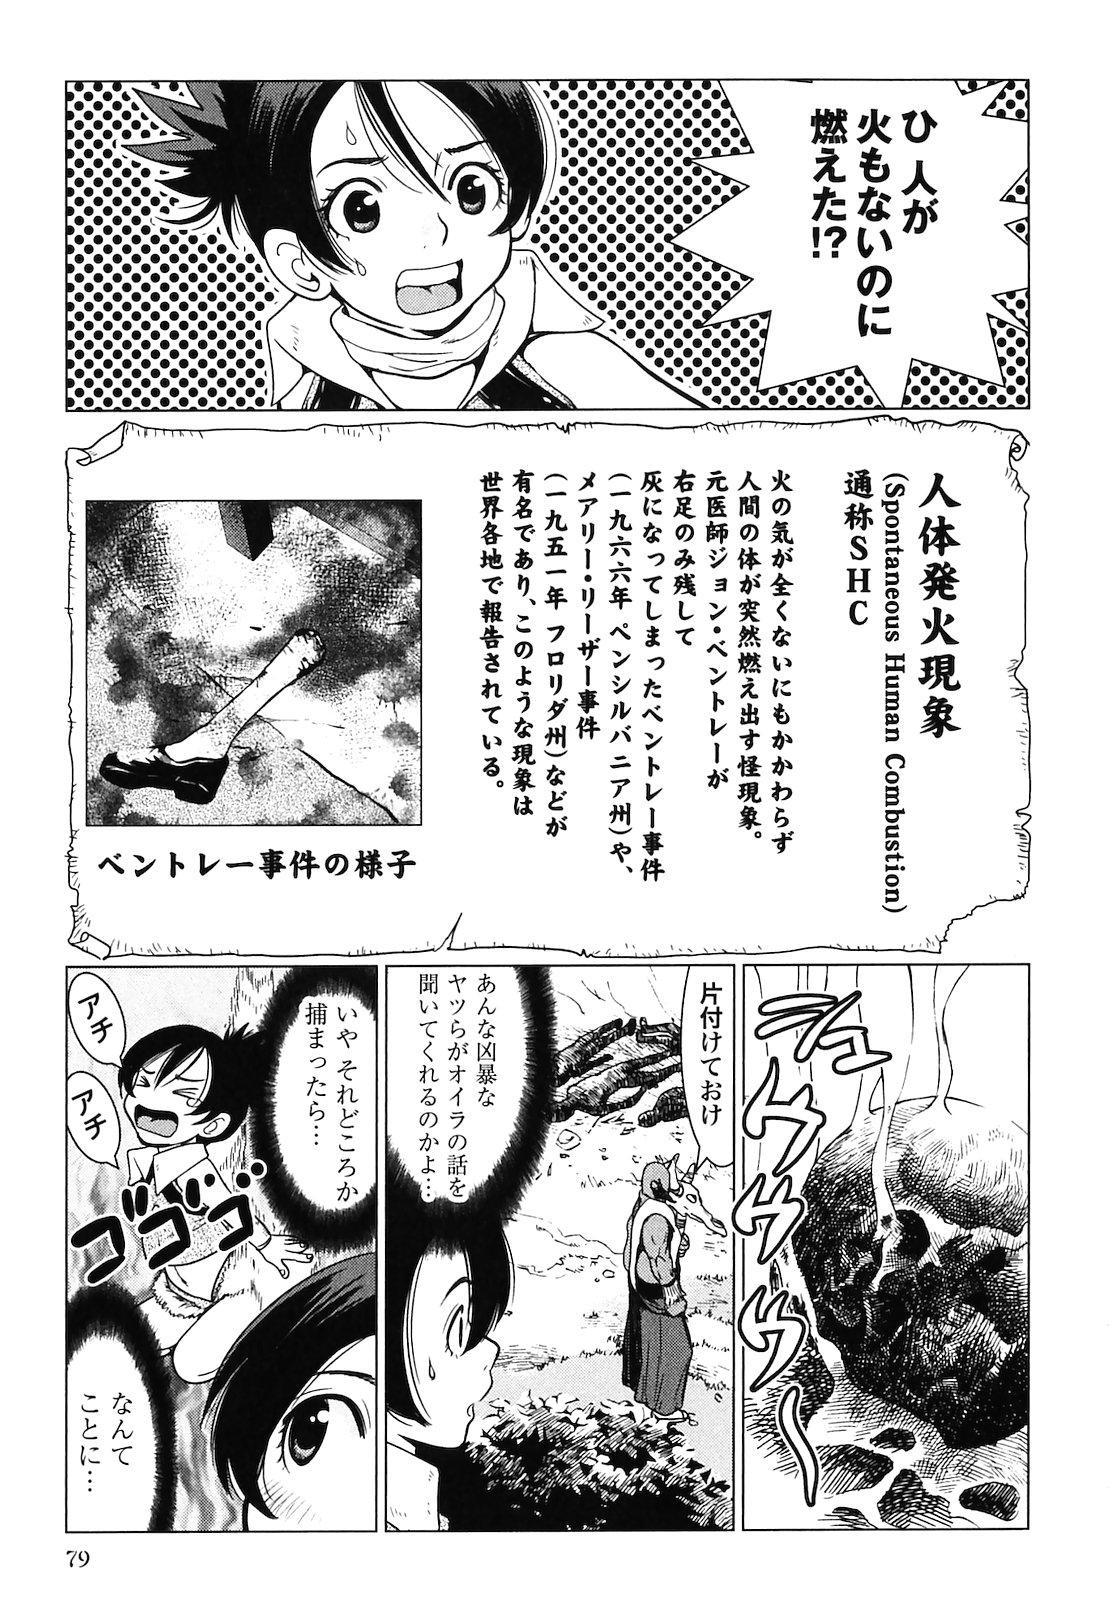 Makyo no Shanana Vol.02 80